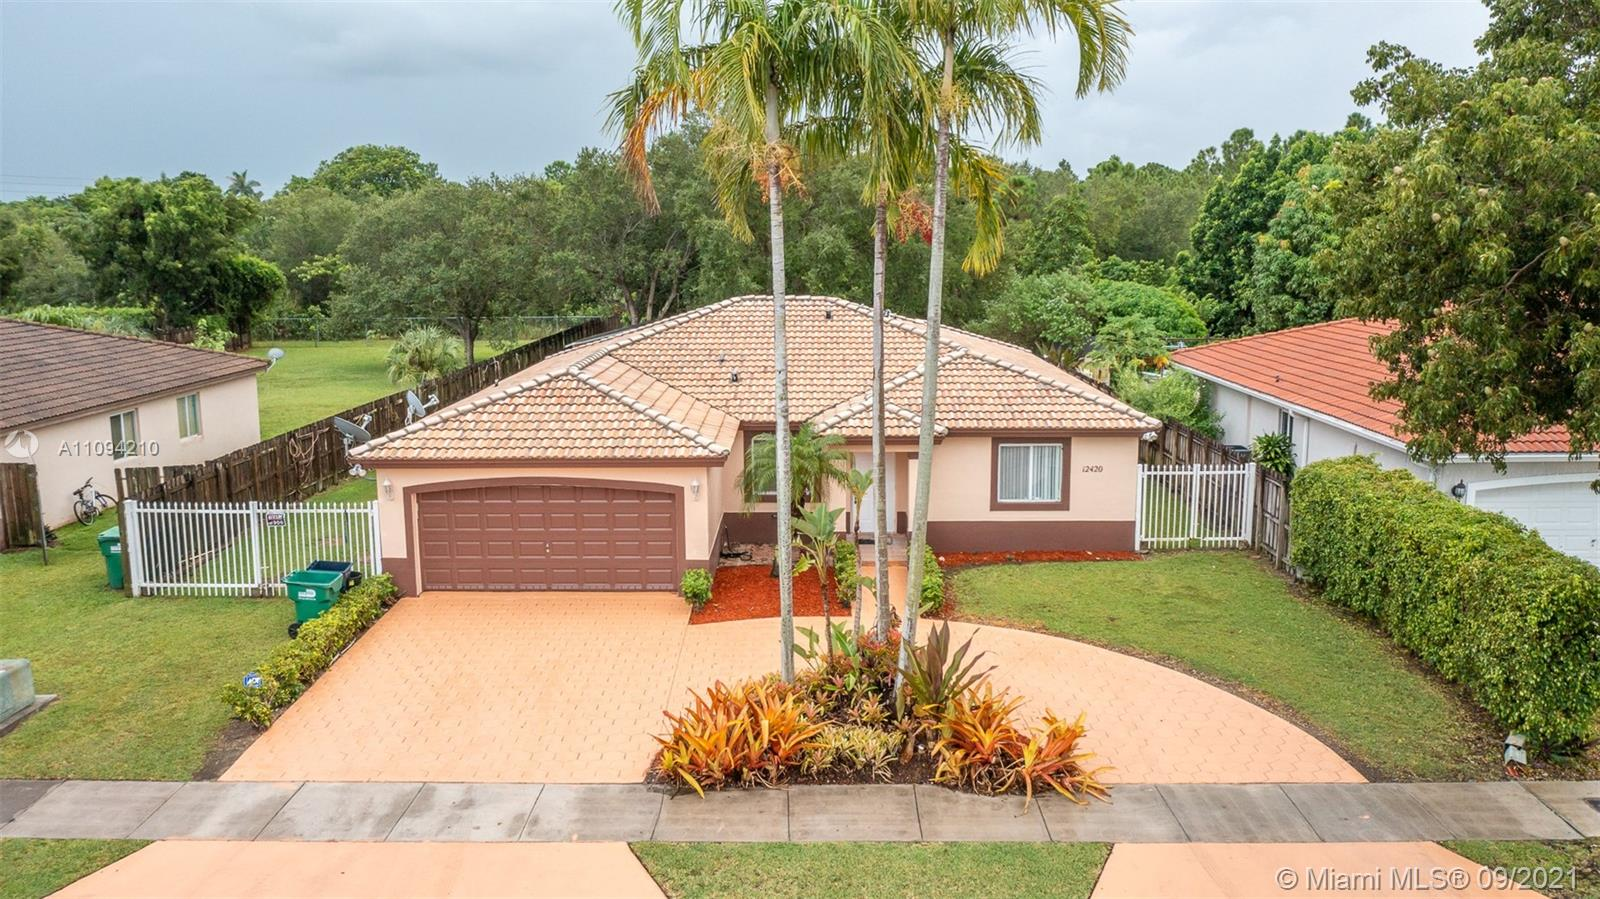 Single Family Home,For Sale,12420 SW 220th St, Miami, Florida 33170,Brickell,realty,broker,condos near me